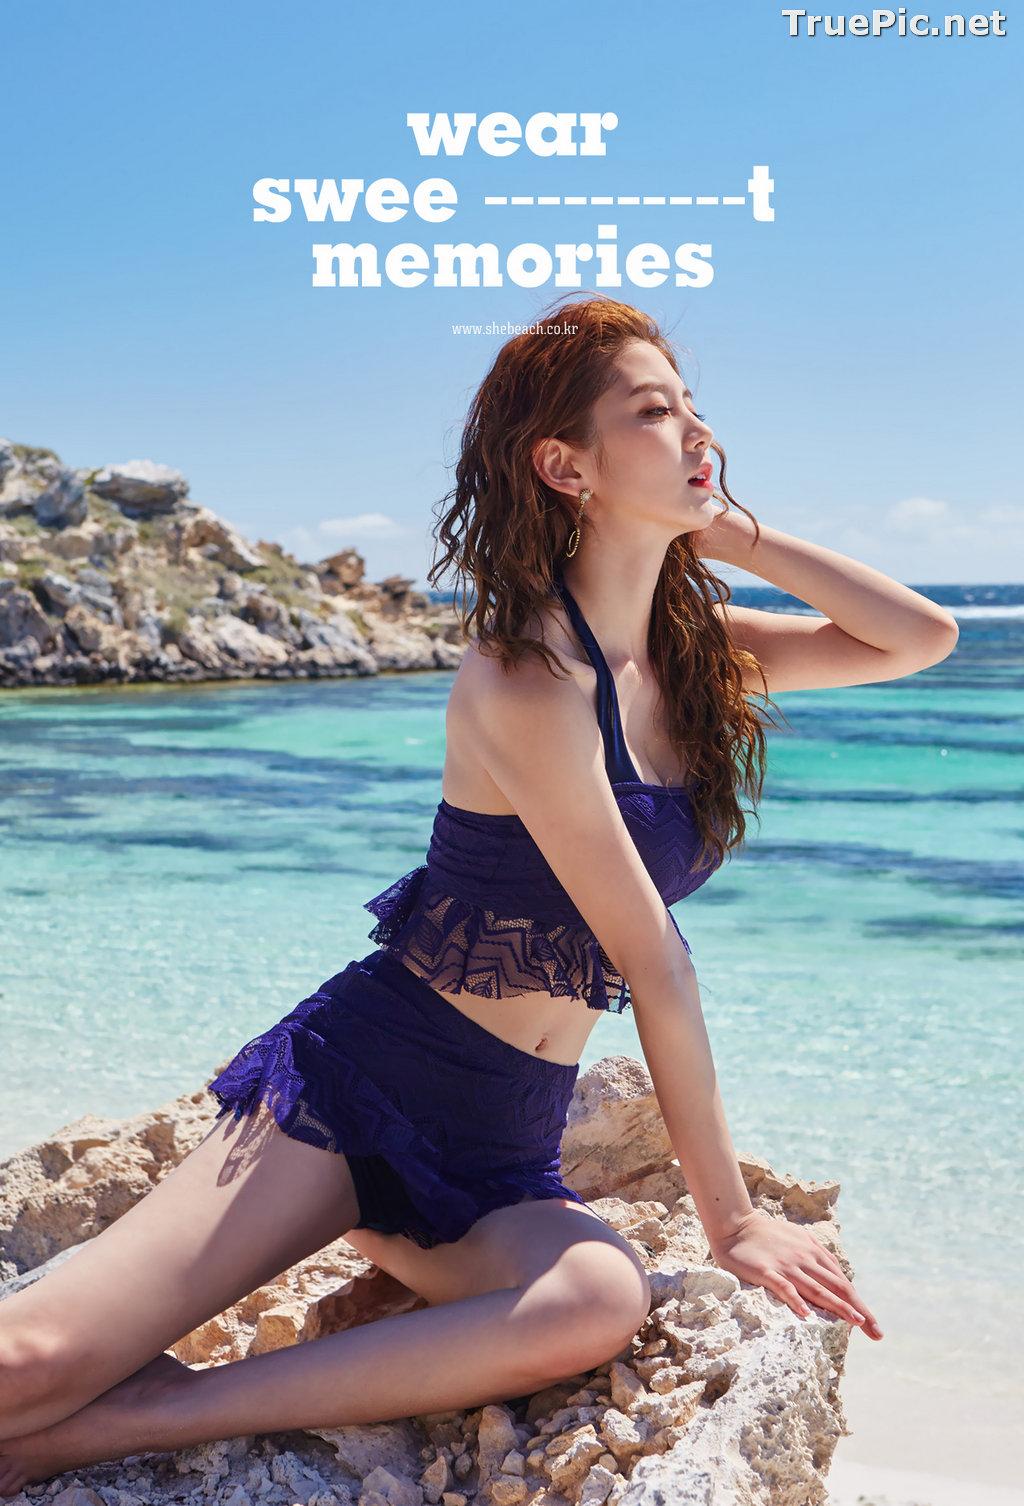 Image Lee Chae Eun - Korean Fashion Model - Magic Fit Beachwear Set - TruePic.net - Picture-5